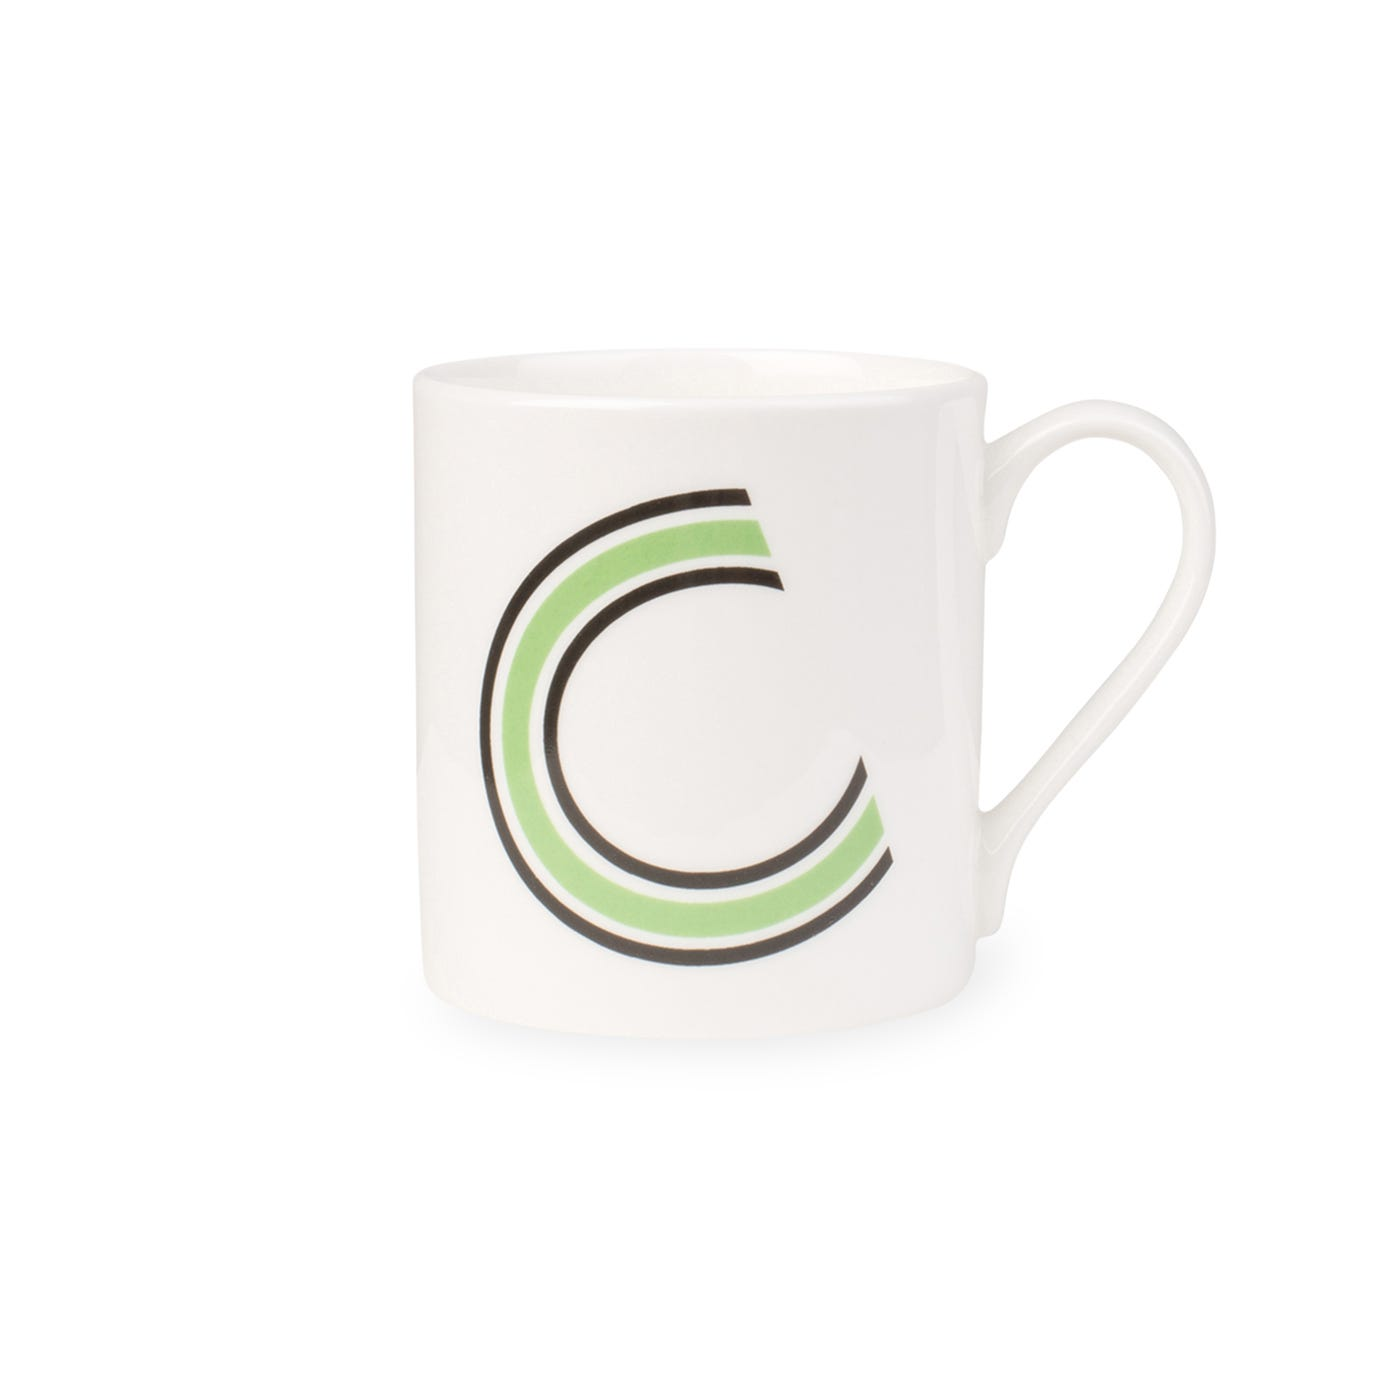 Heal's Heal's Heritage Alphabet Mug C